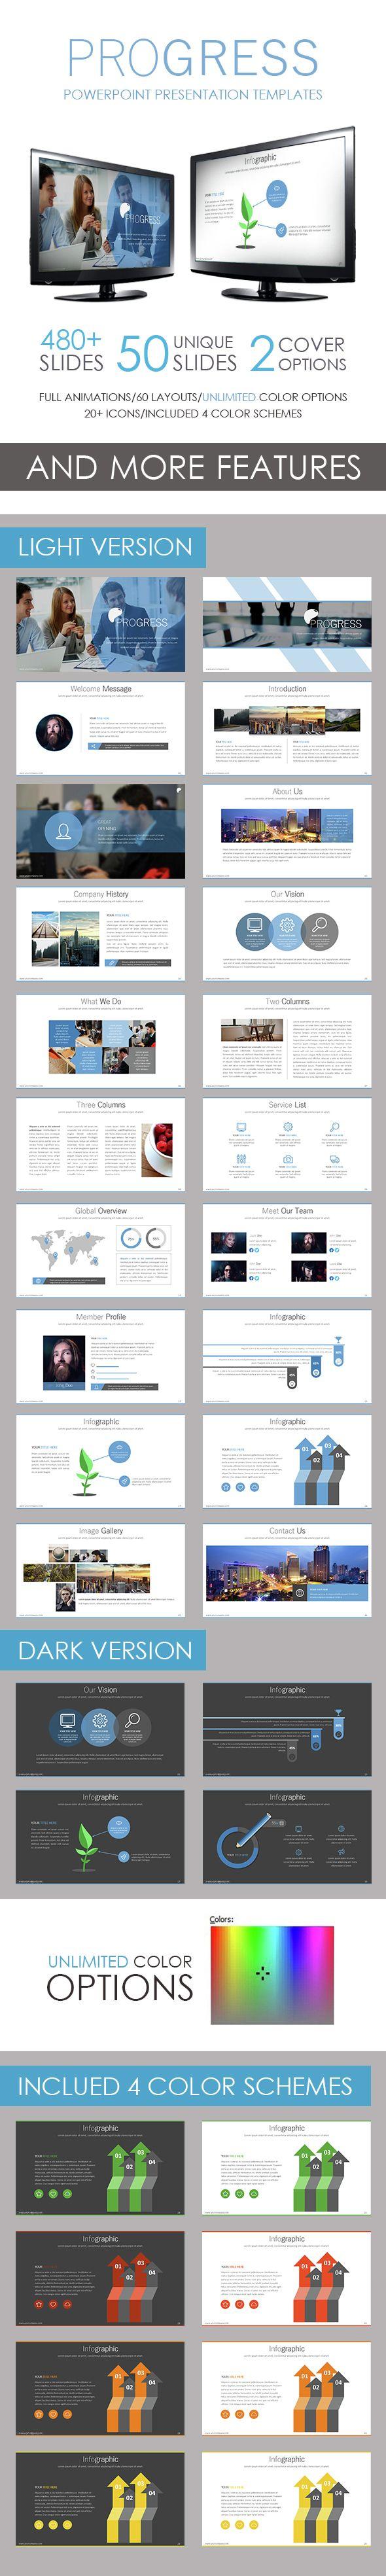 Progress PowerPoint Template Pinterest